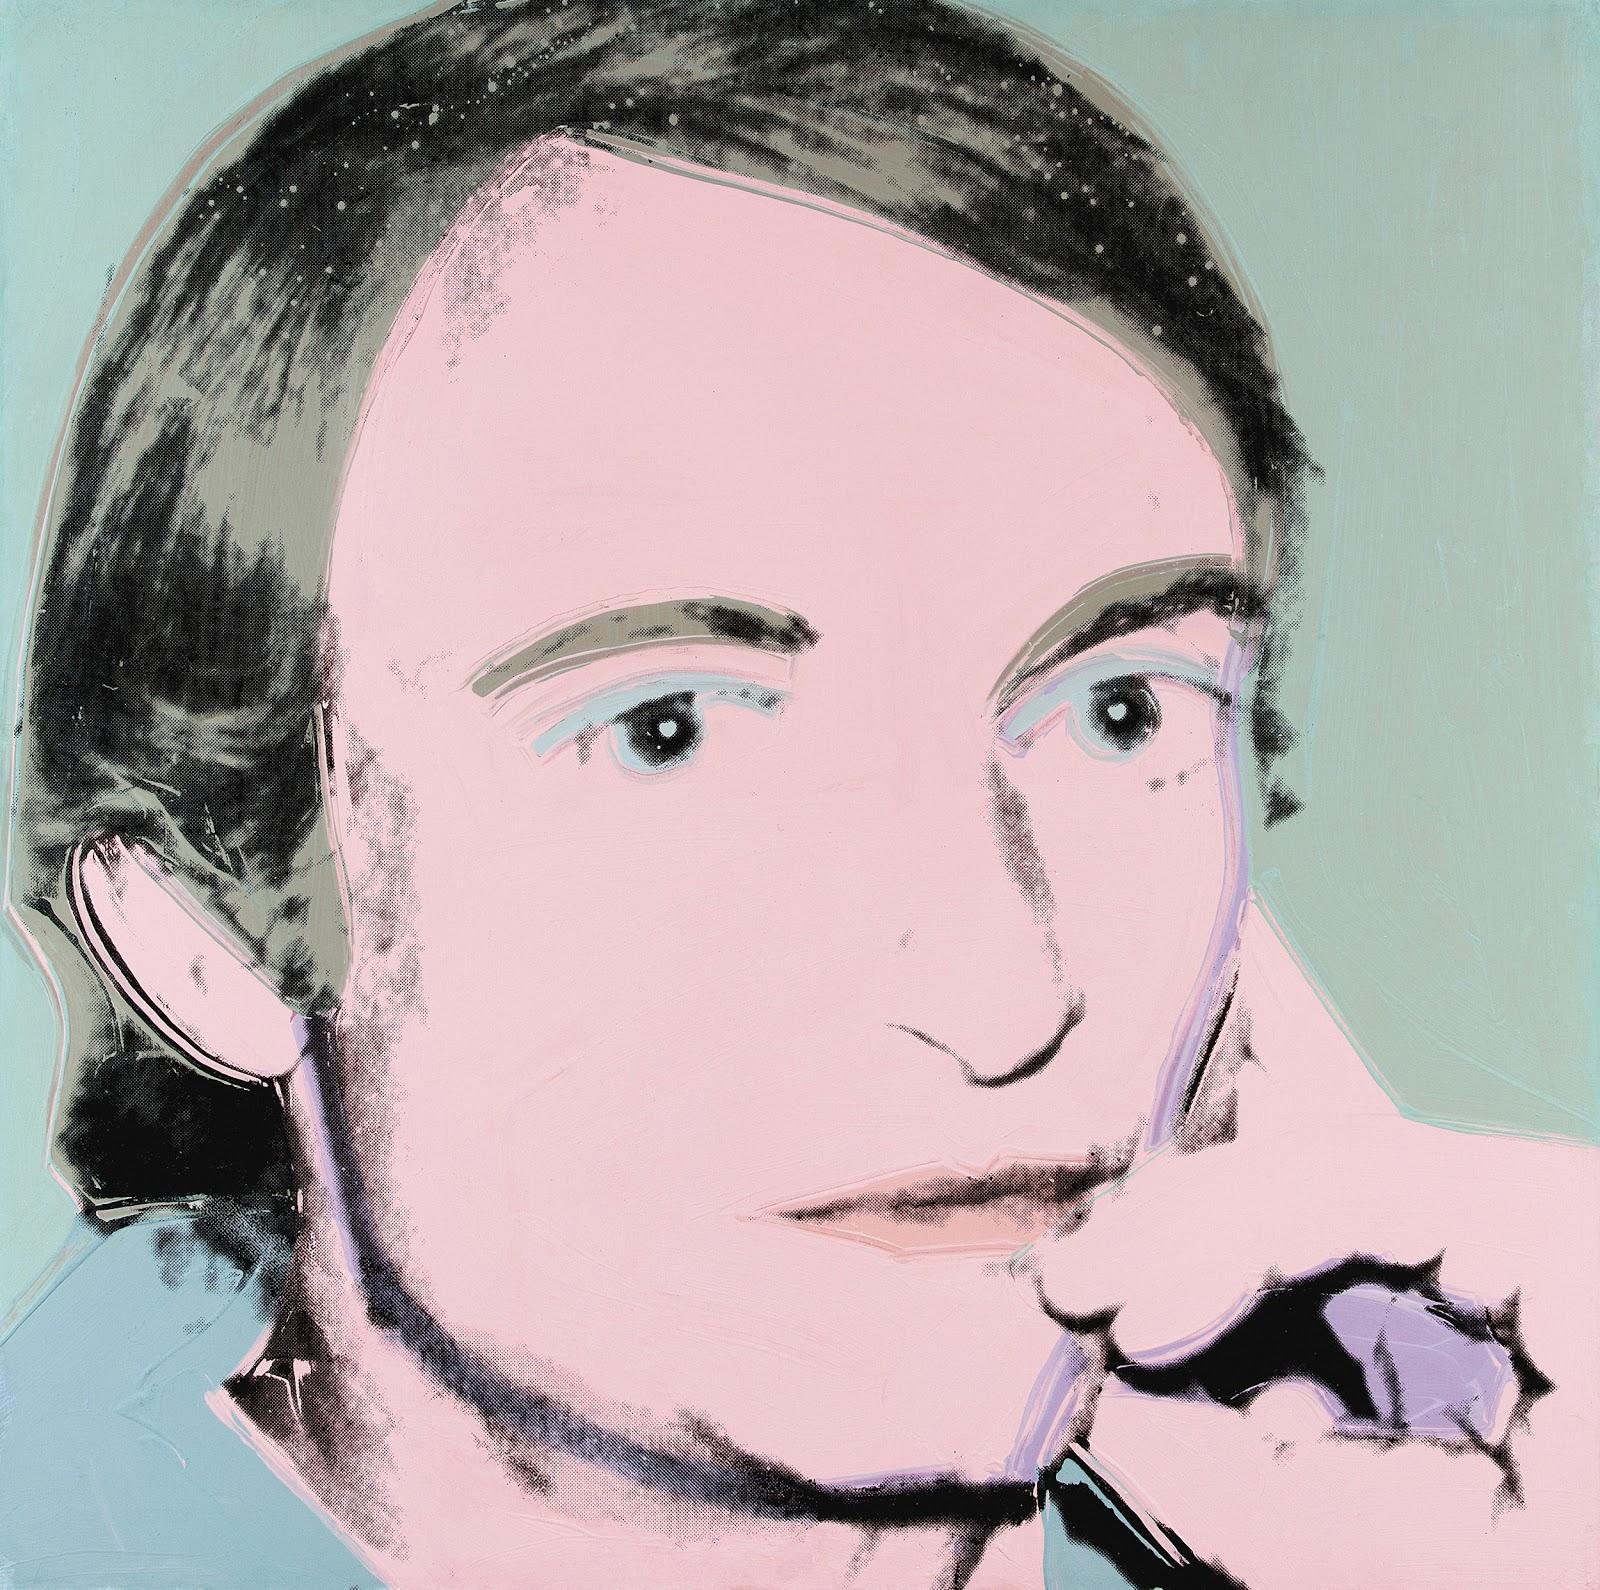 Andy Warhol Pop Art Quotes: Quotes / Citazioni